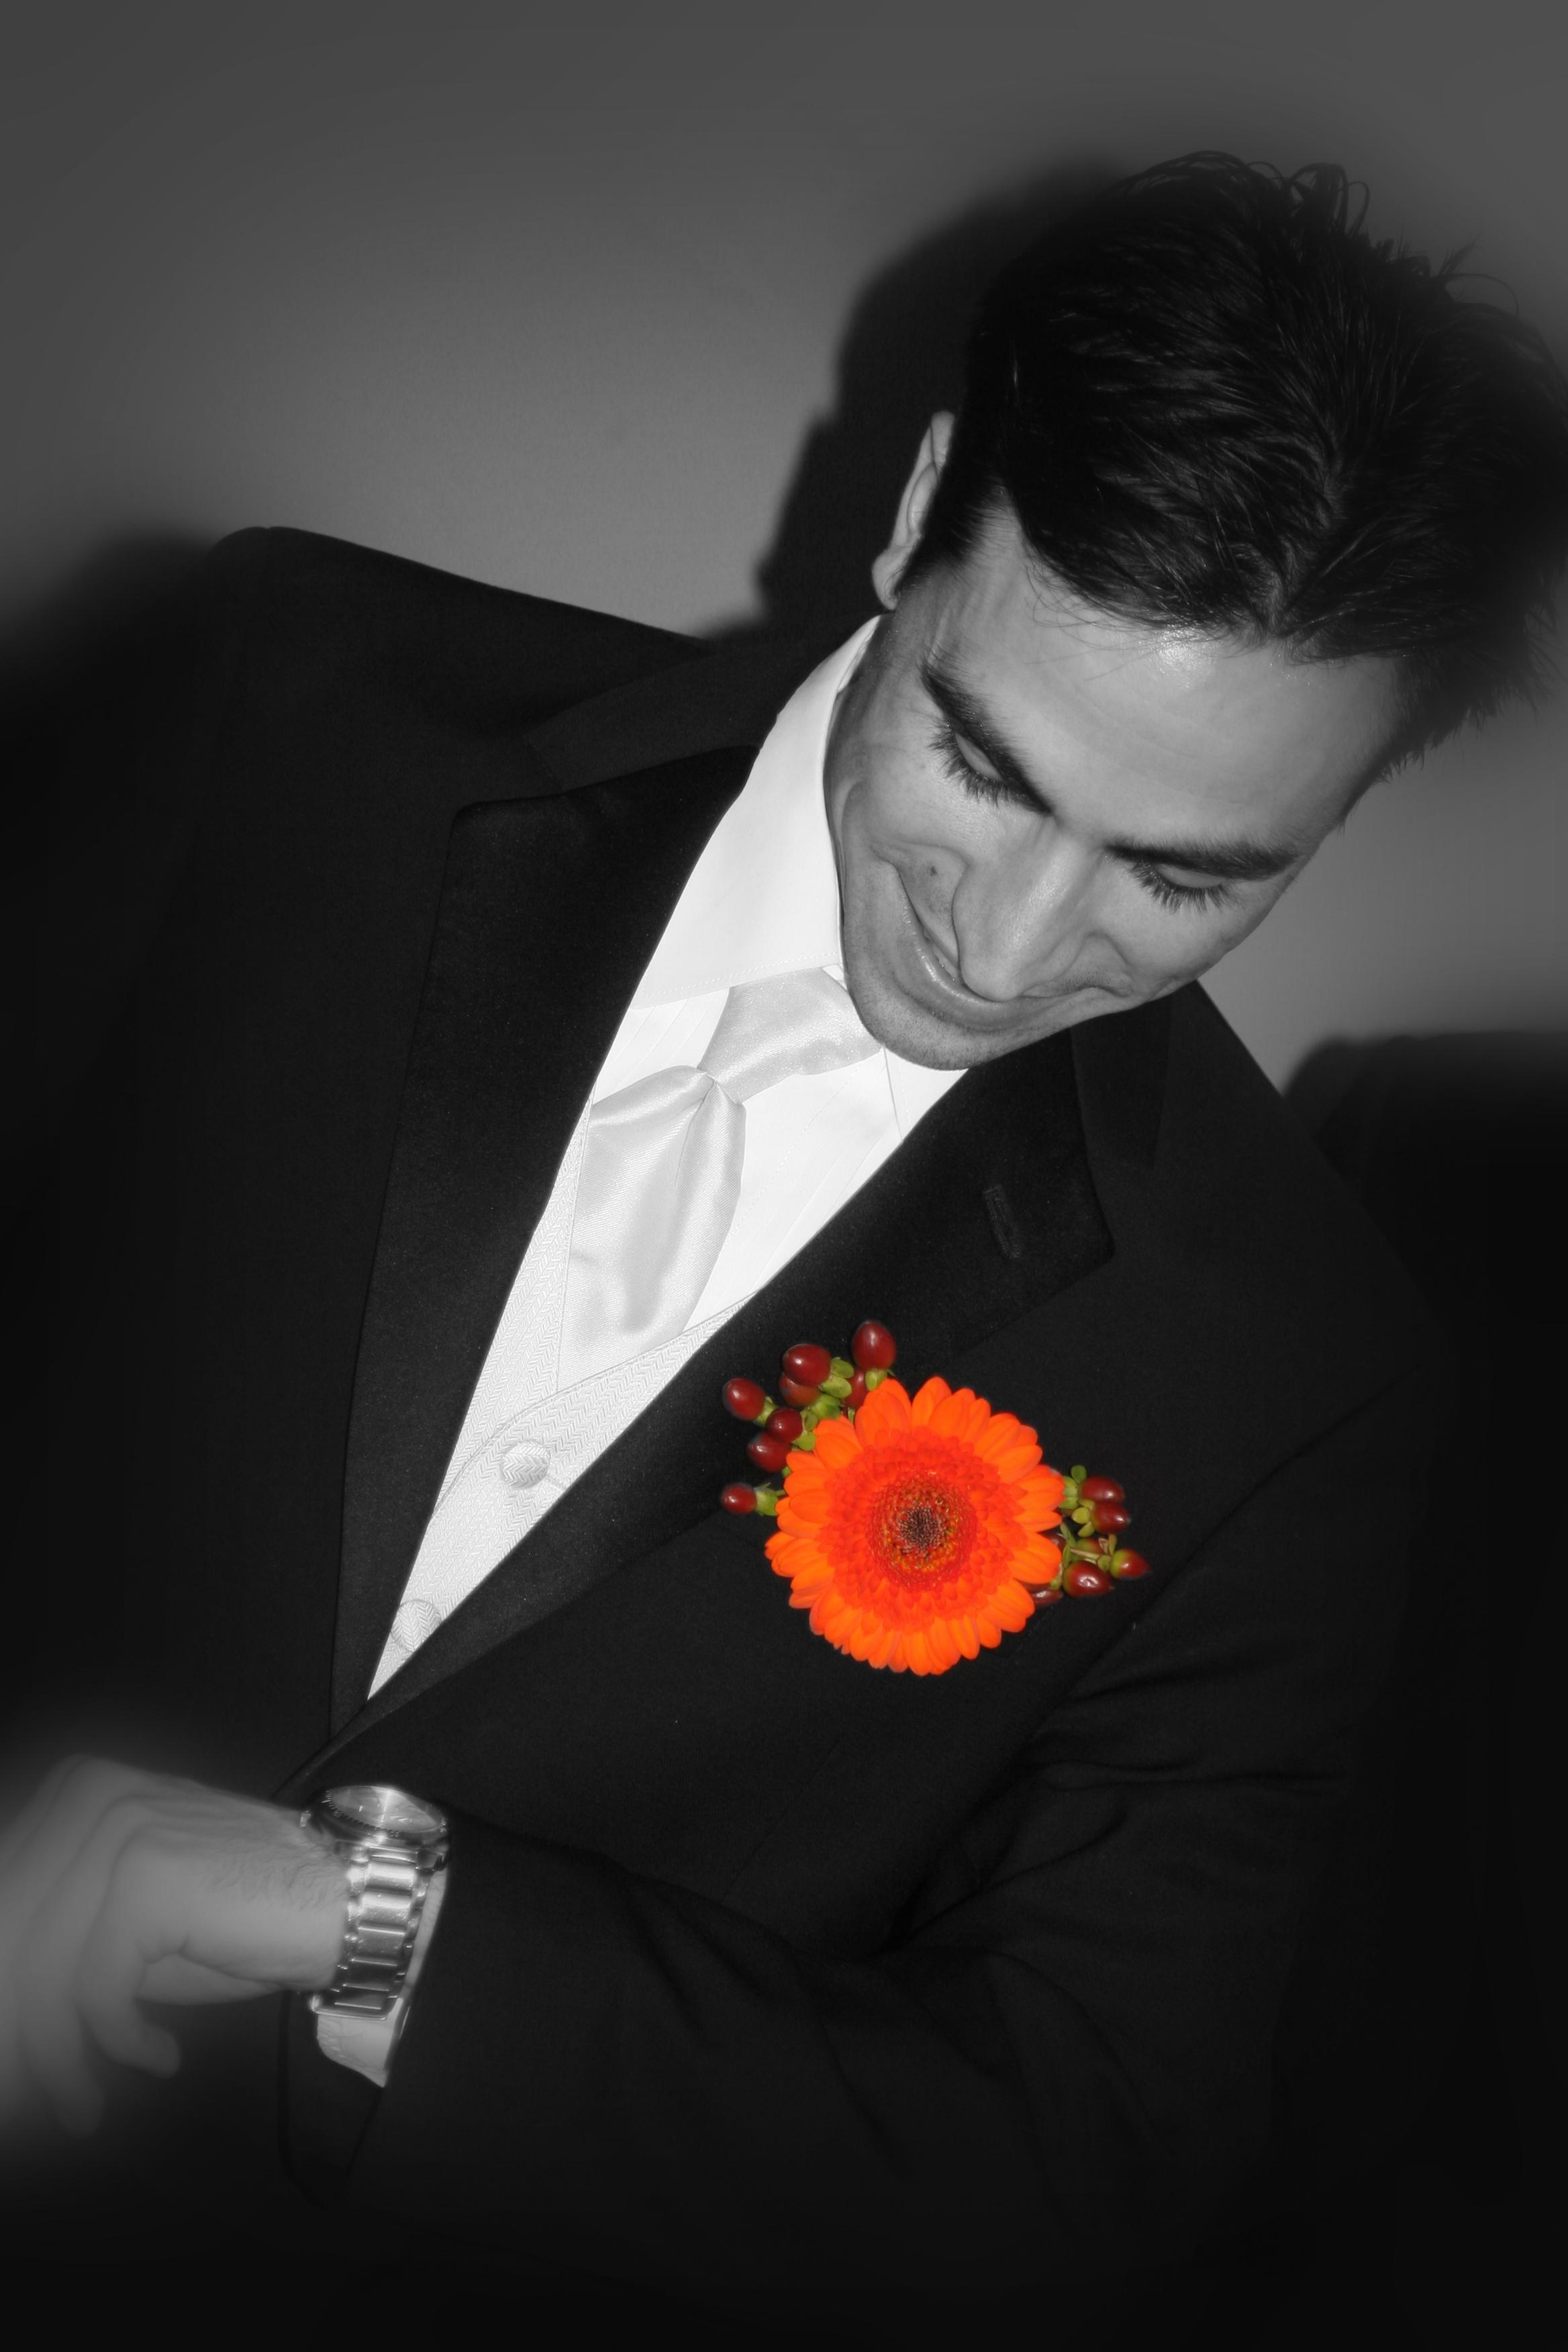 Ceremony, Flowers & Decor, Groom, Preparation, Jen casey photography